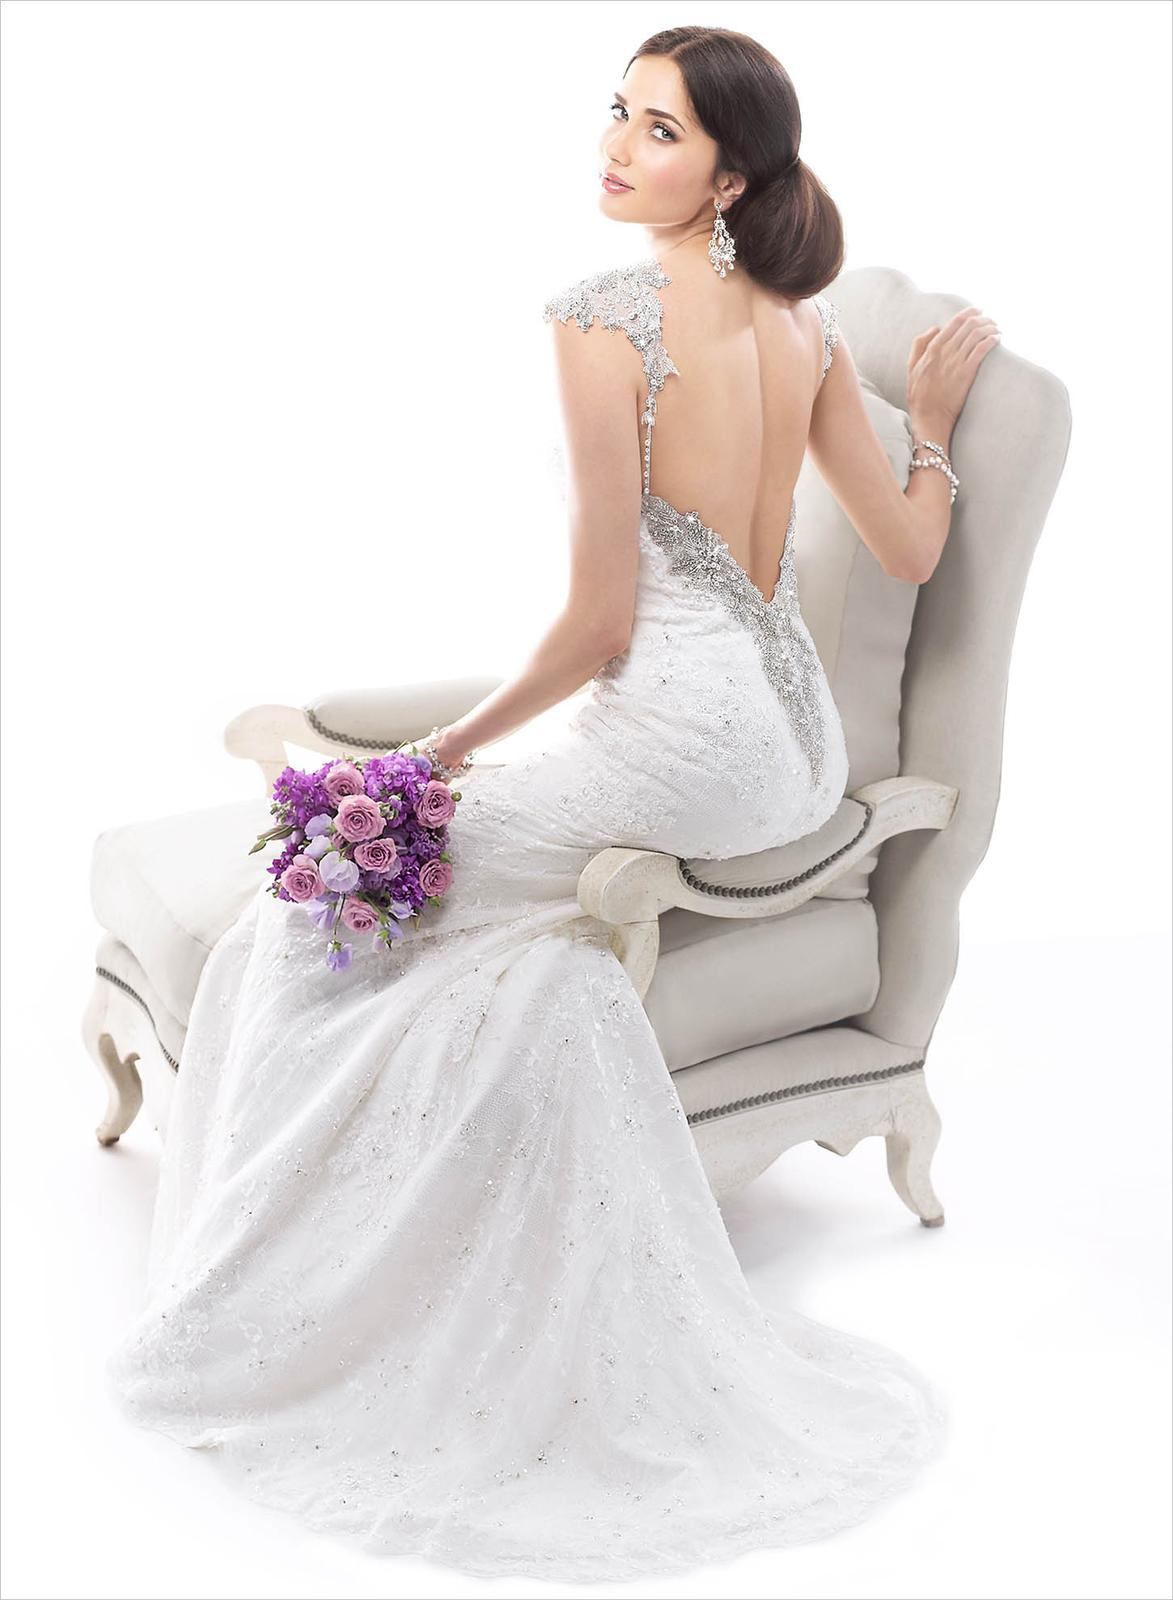 73cfed72d997 Šaty s holým chrbtom - - Svadobné šaty